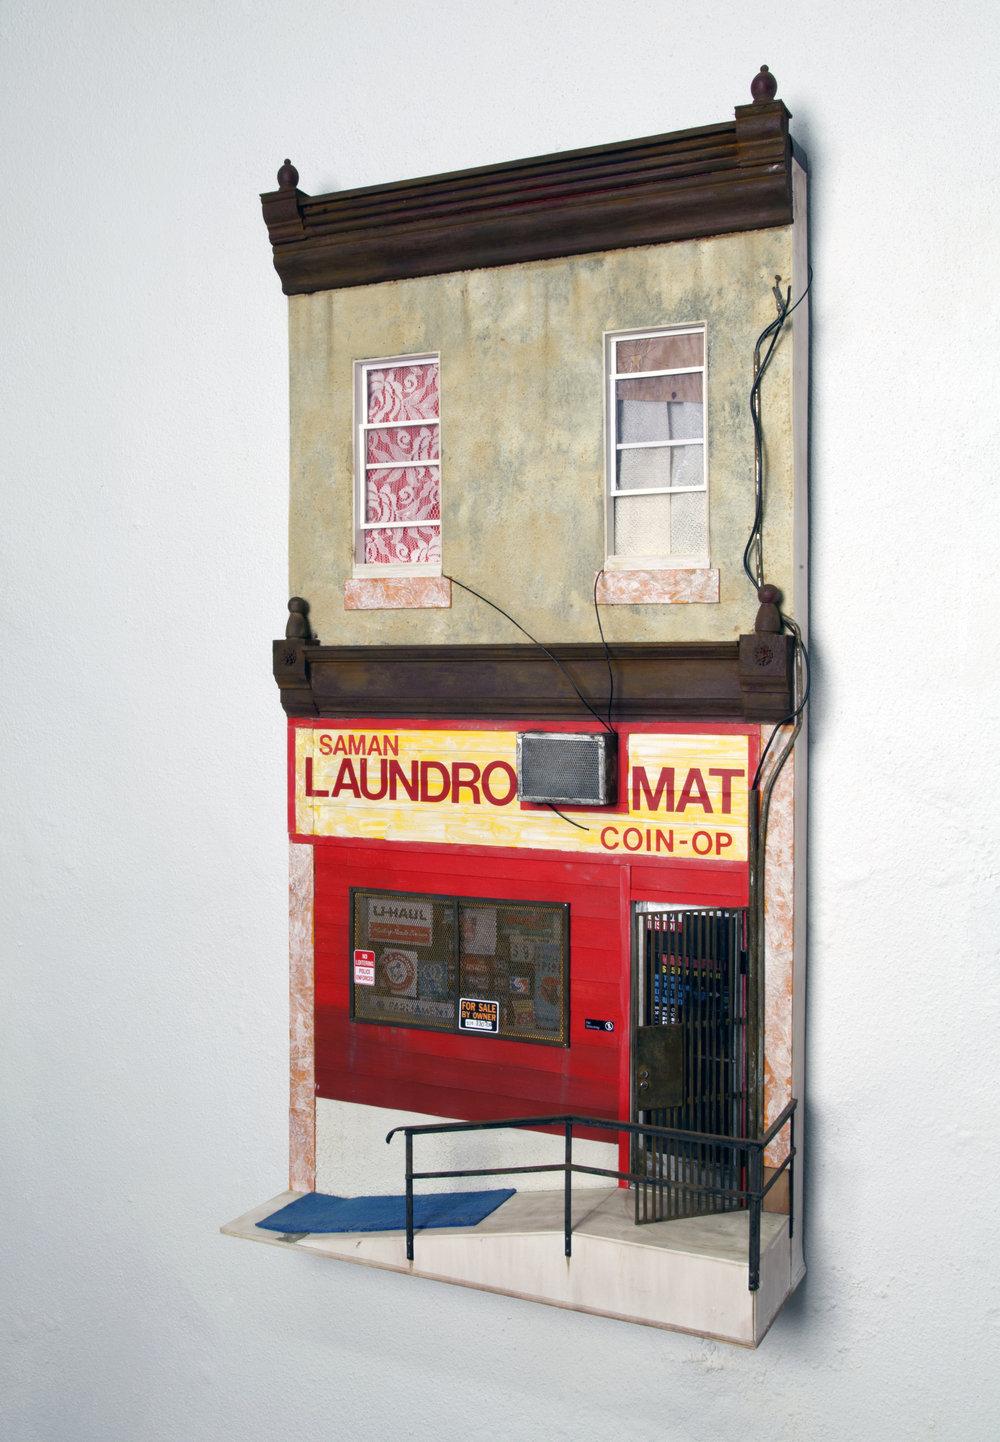 Saman Laundromat